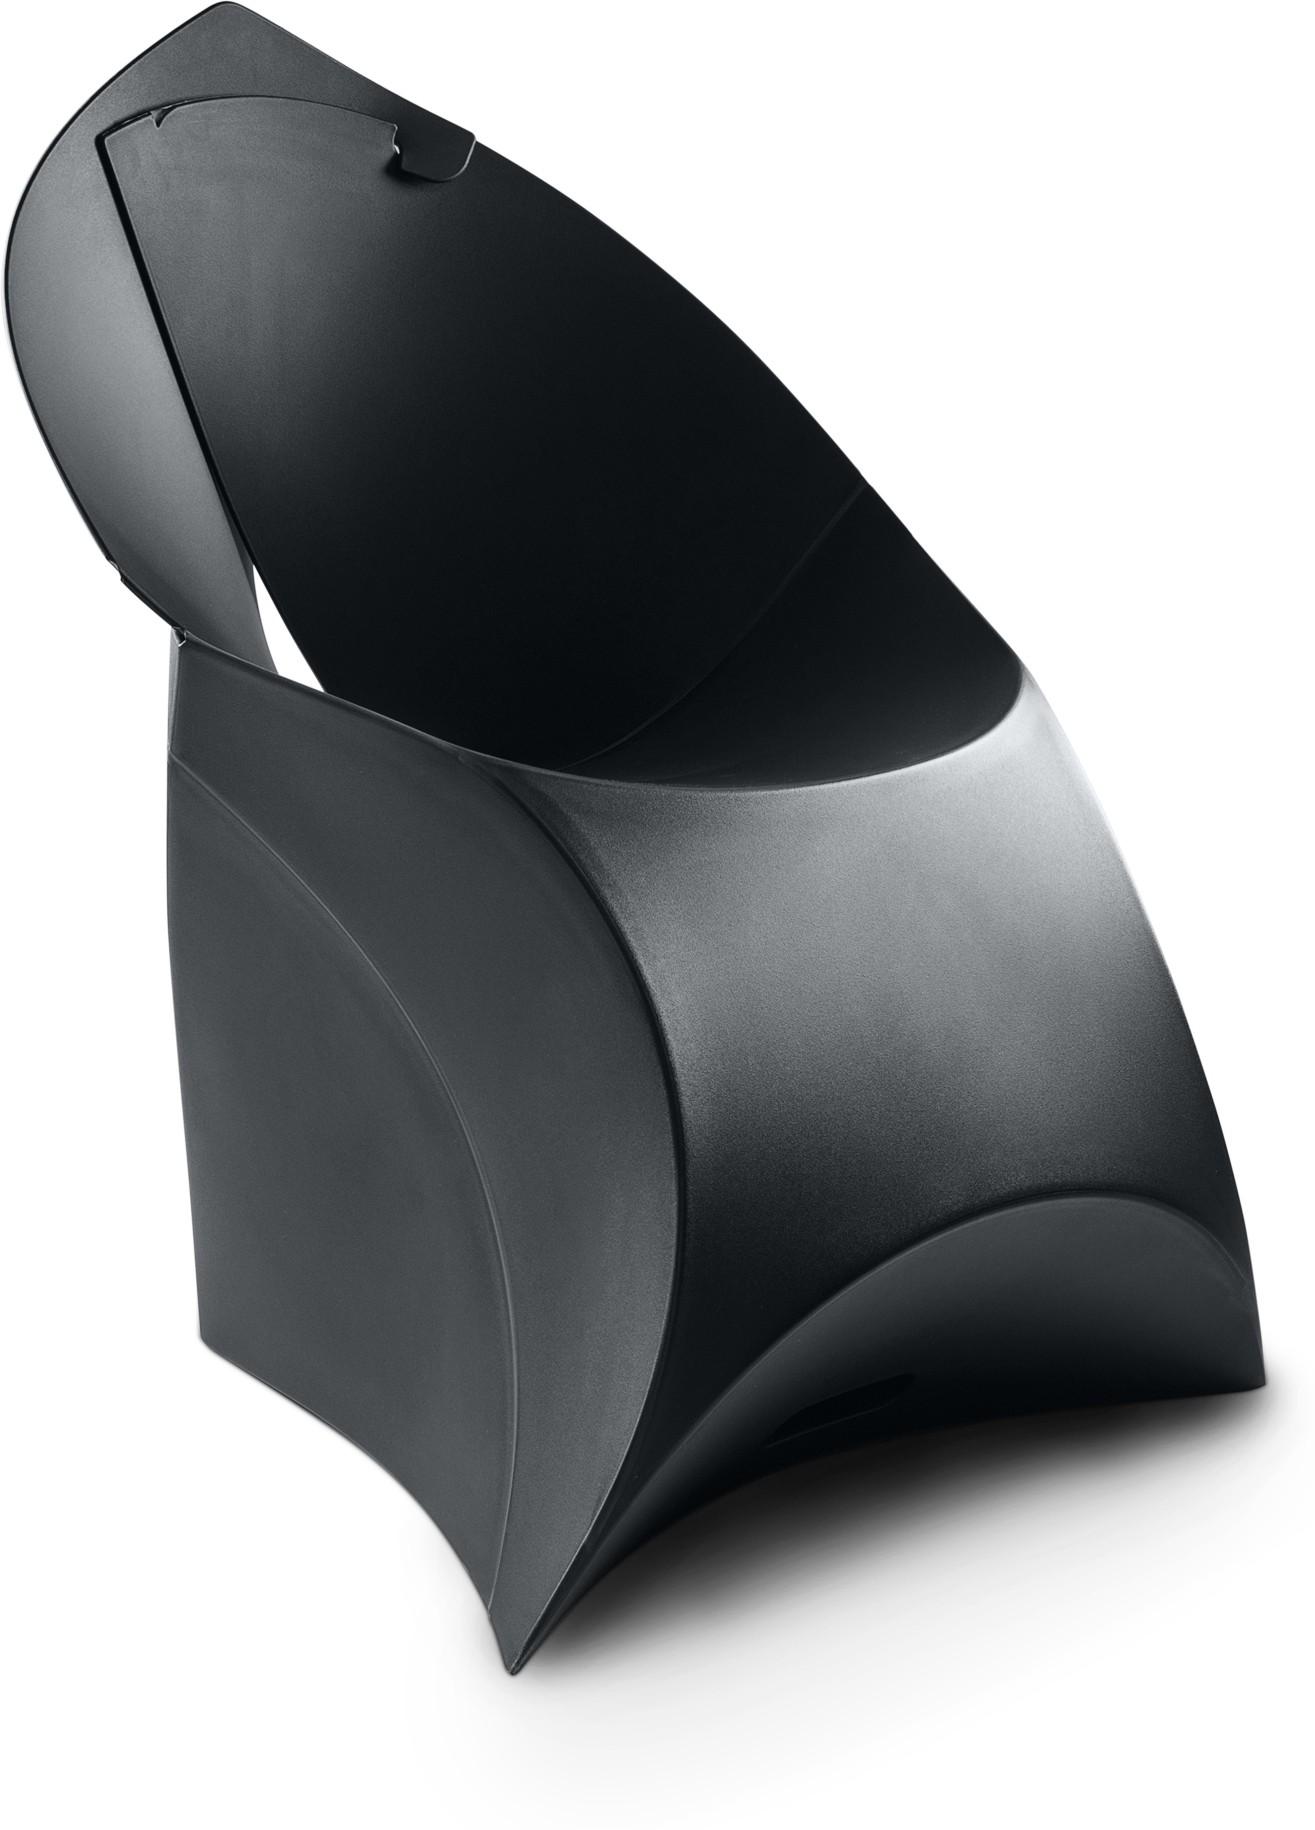 View Flux Plastic Living Room Chair(Finish Color - Jet Black) Furniture (Flux)